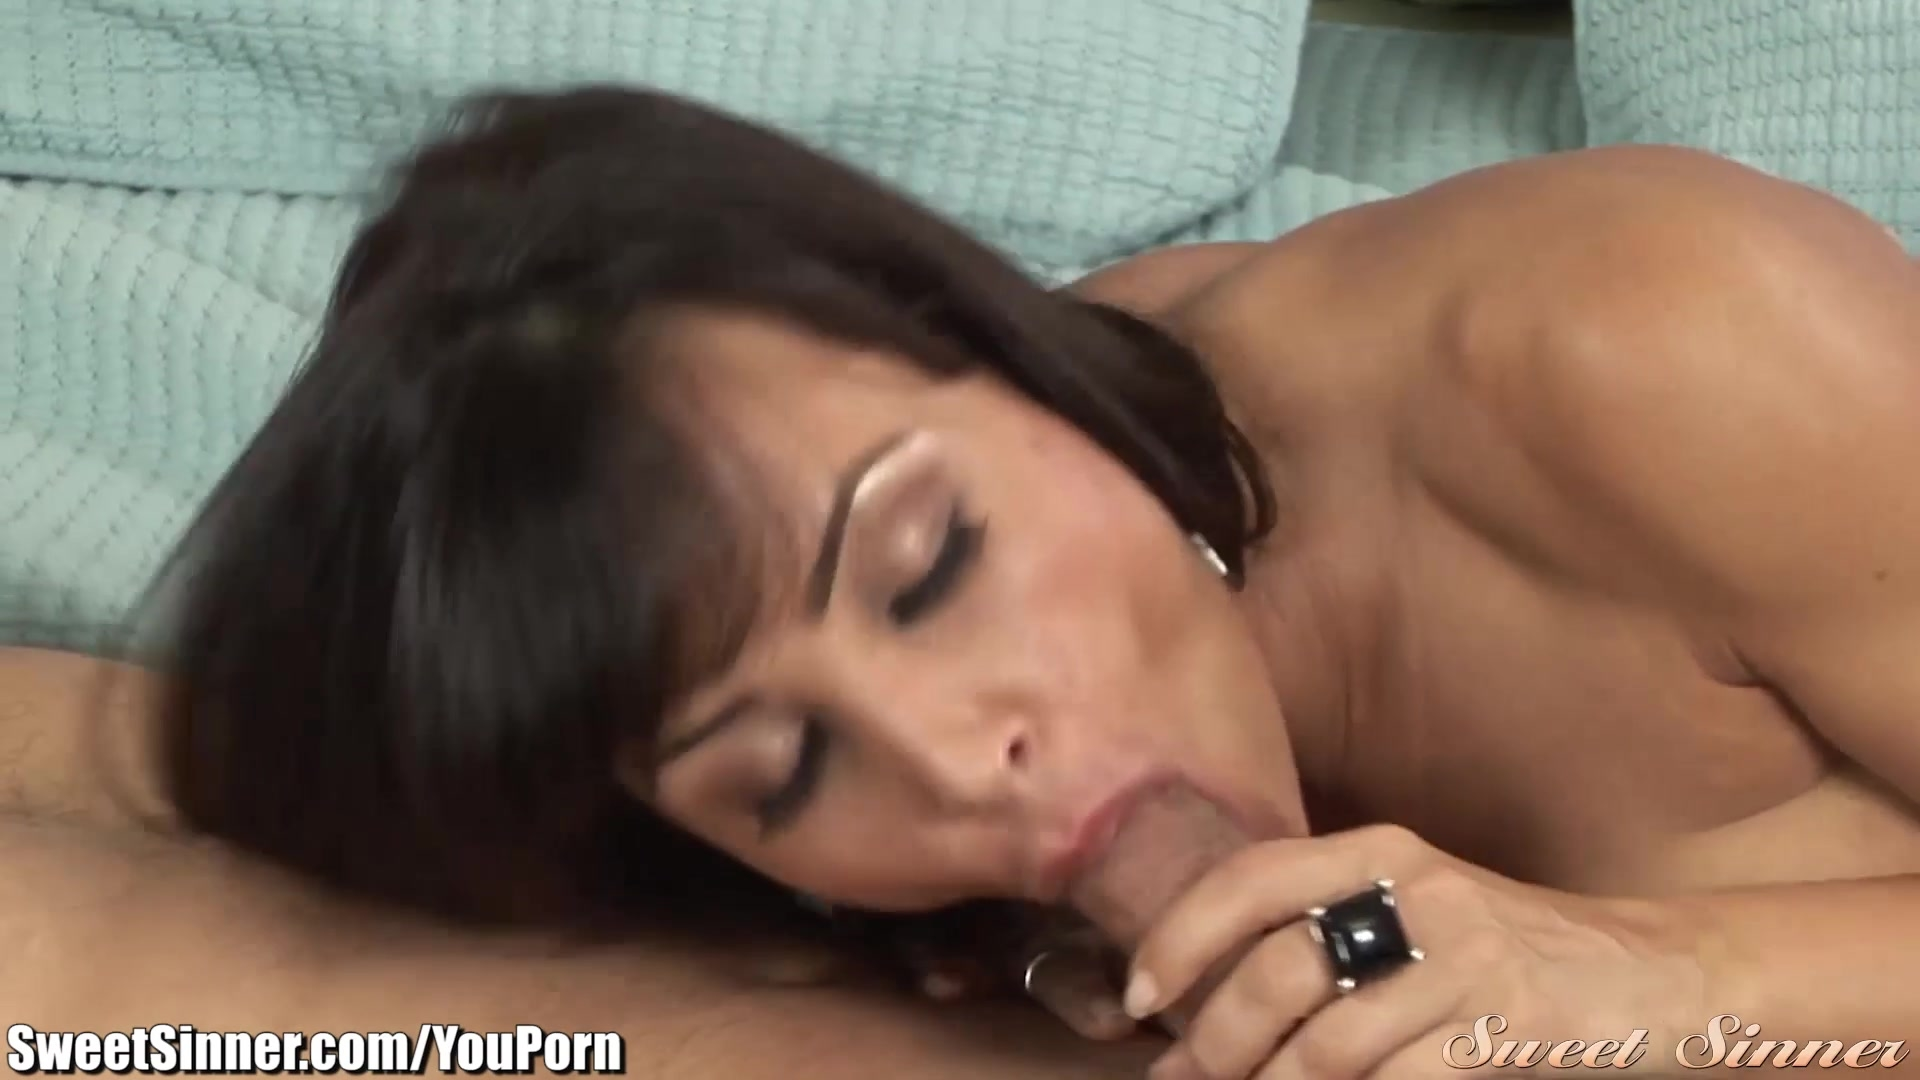 Free lisa ann step mom porn videos from thumbzilla